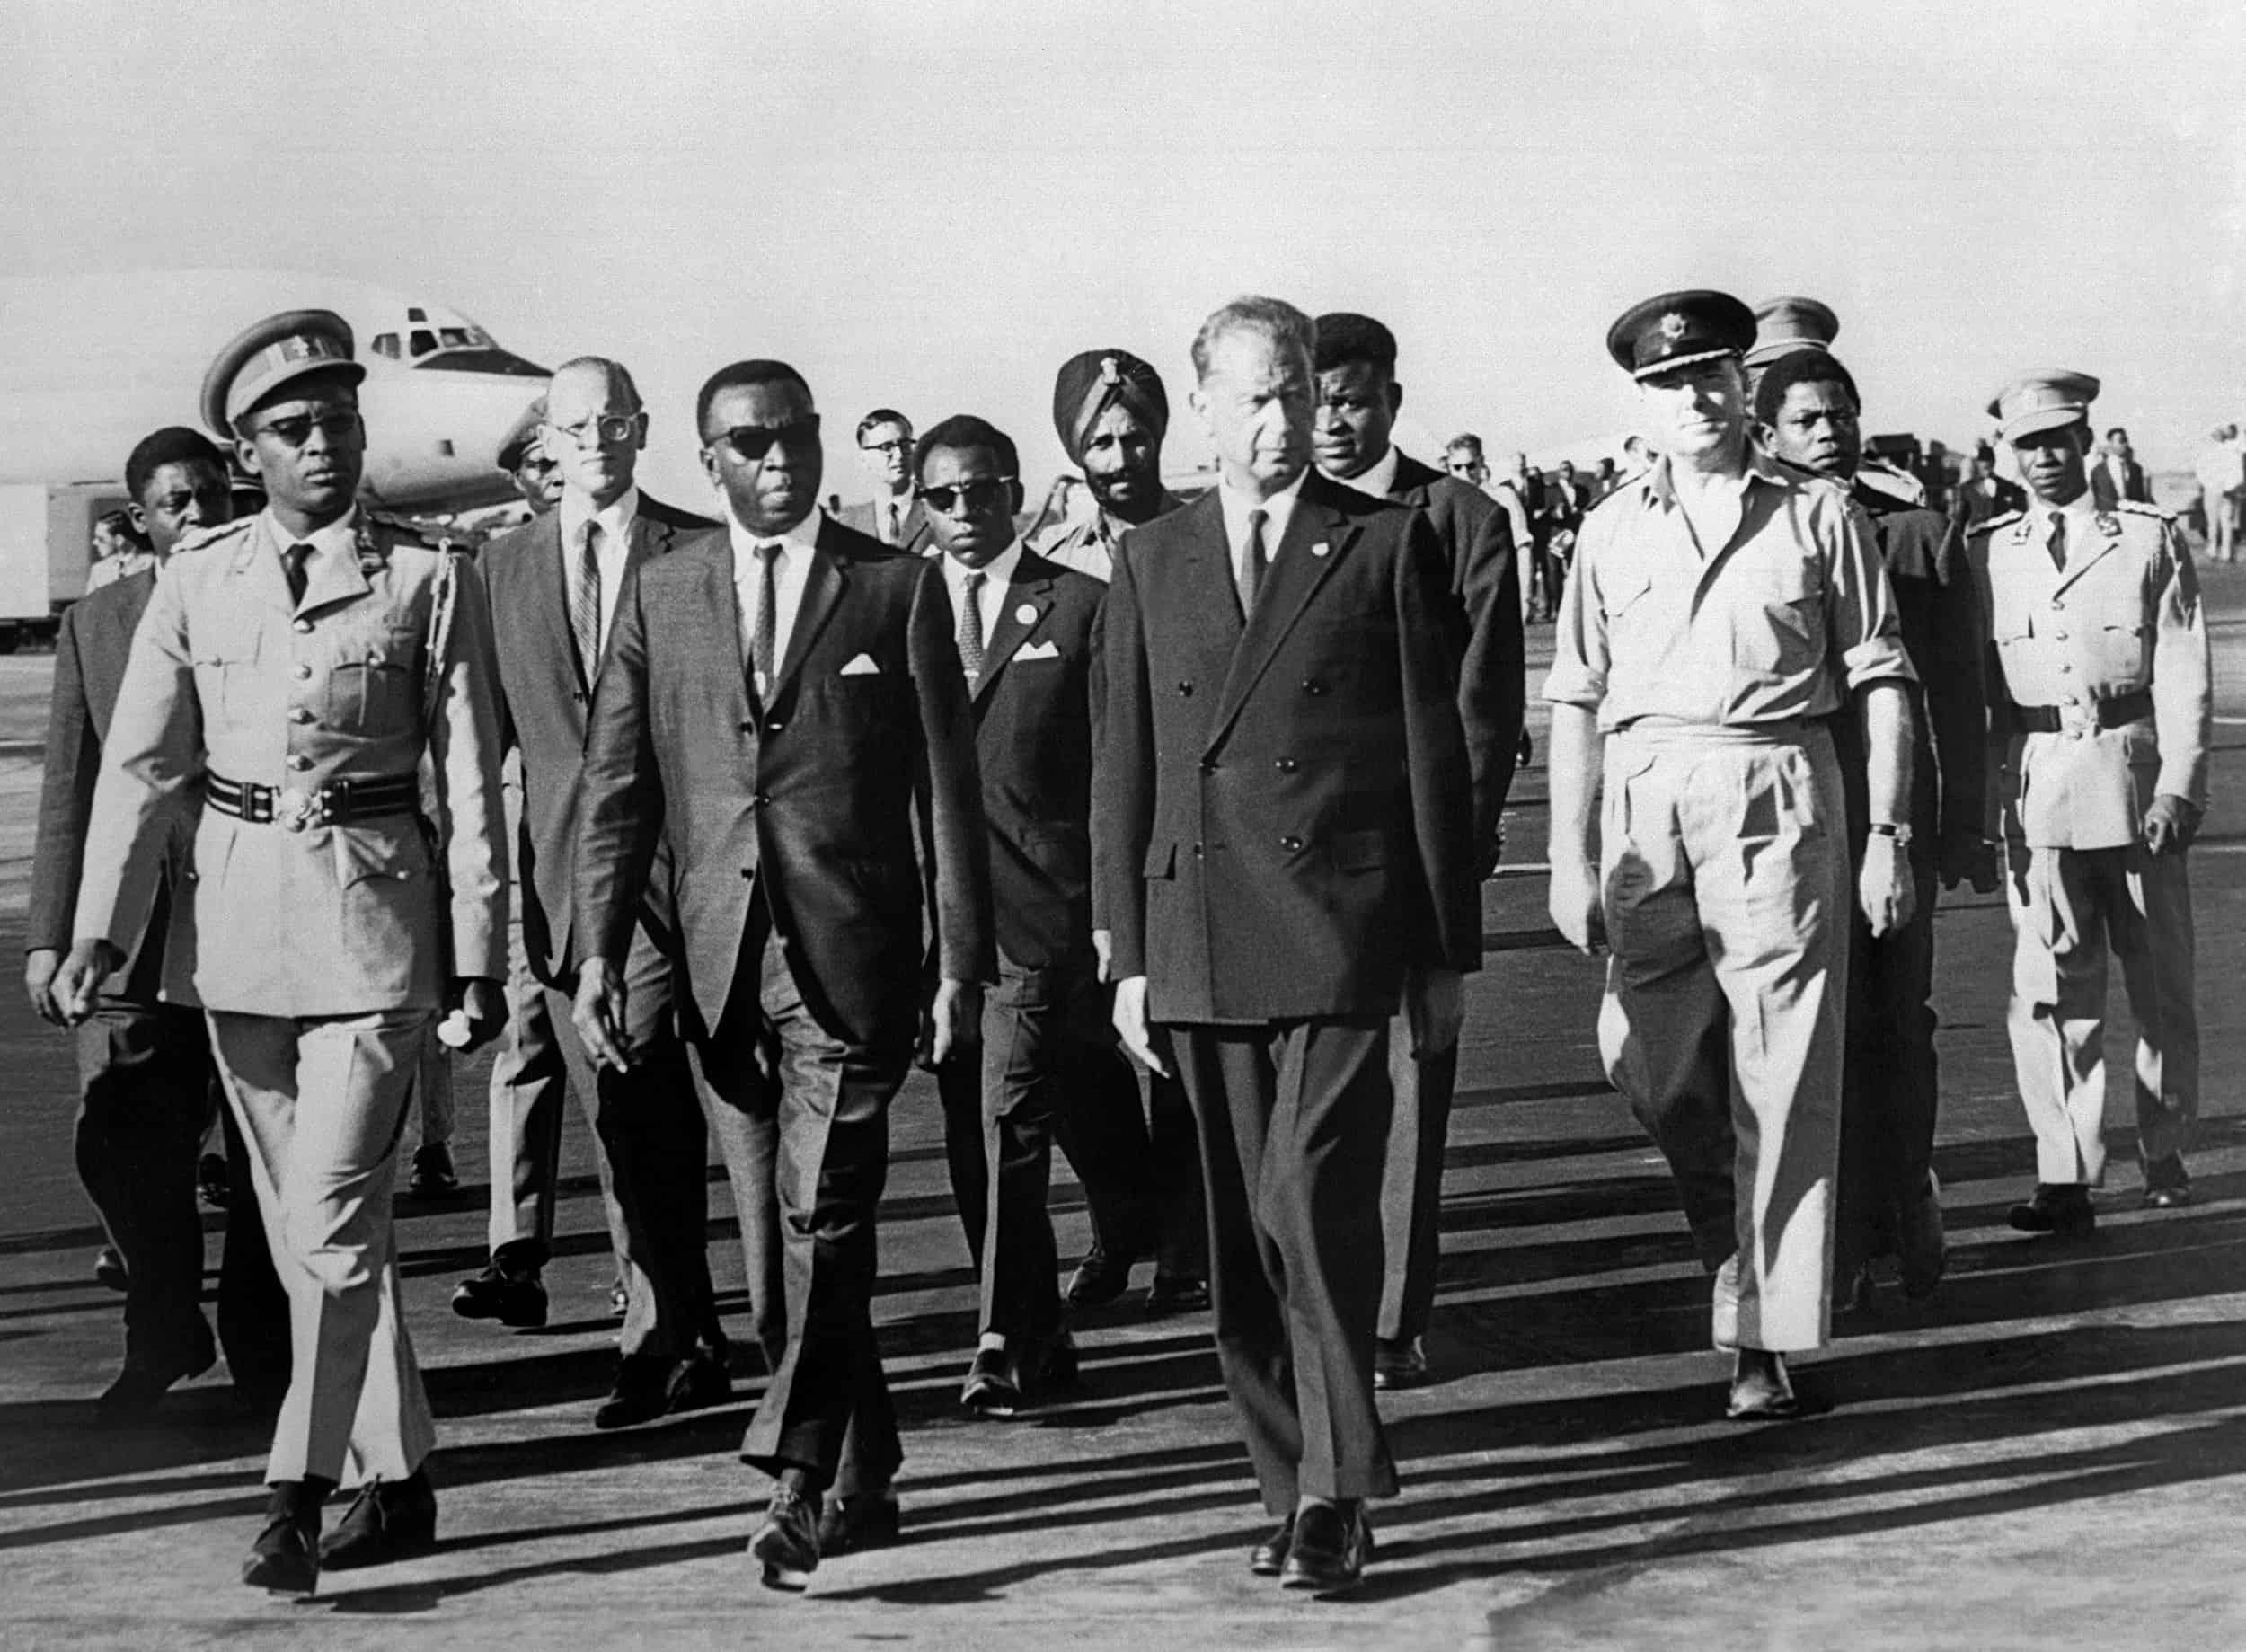 The late U.N. Secretary-General Dag Hammarskjold in 1961.